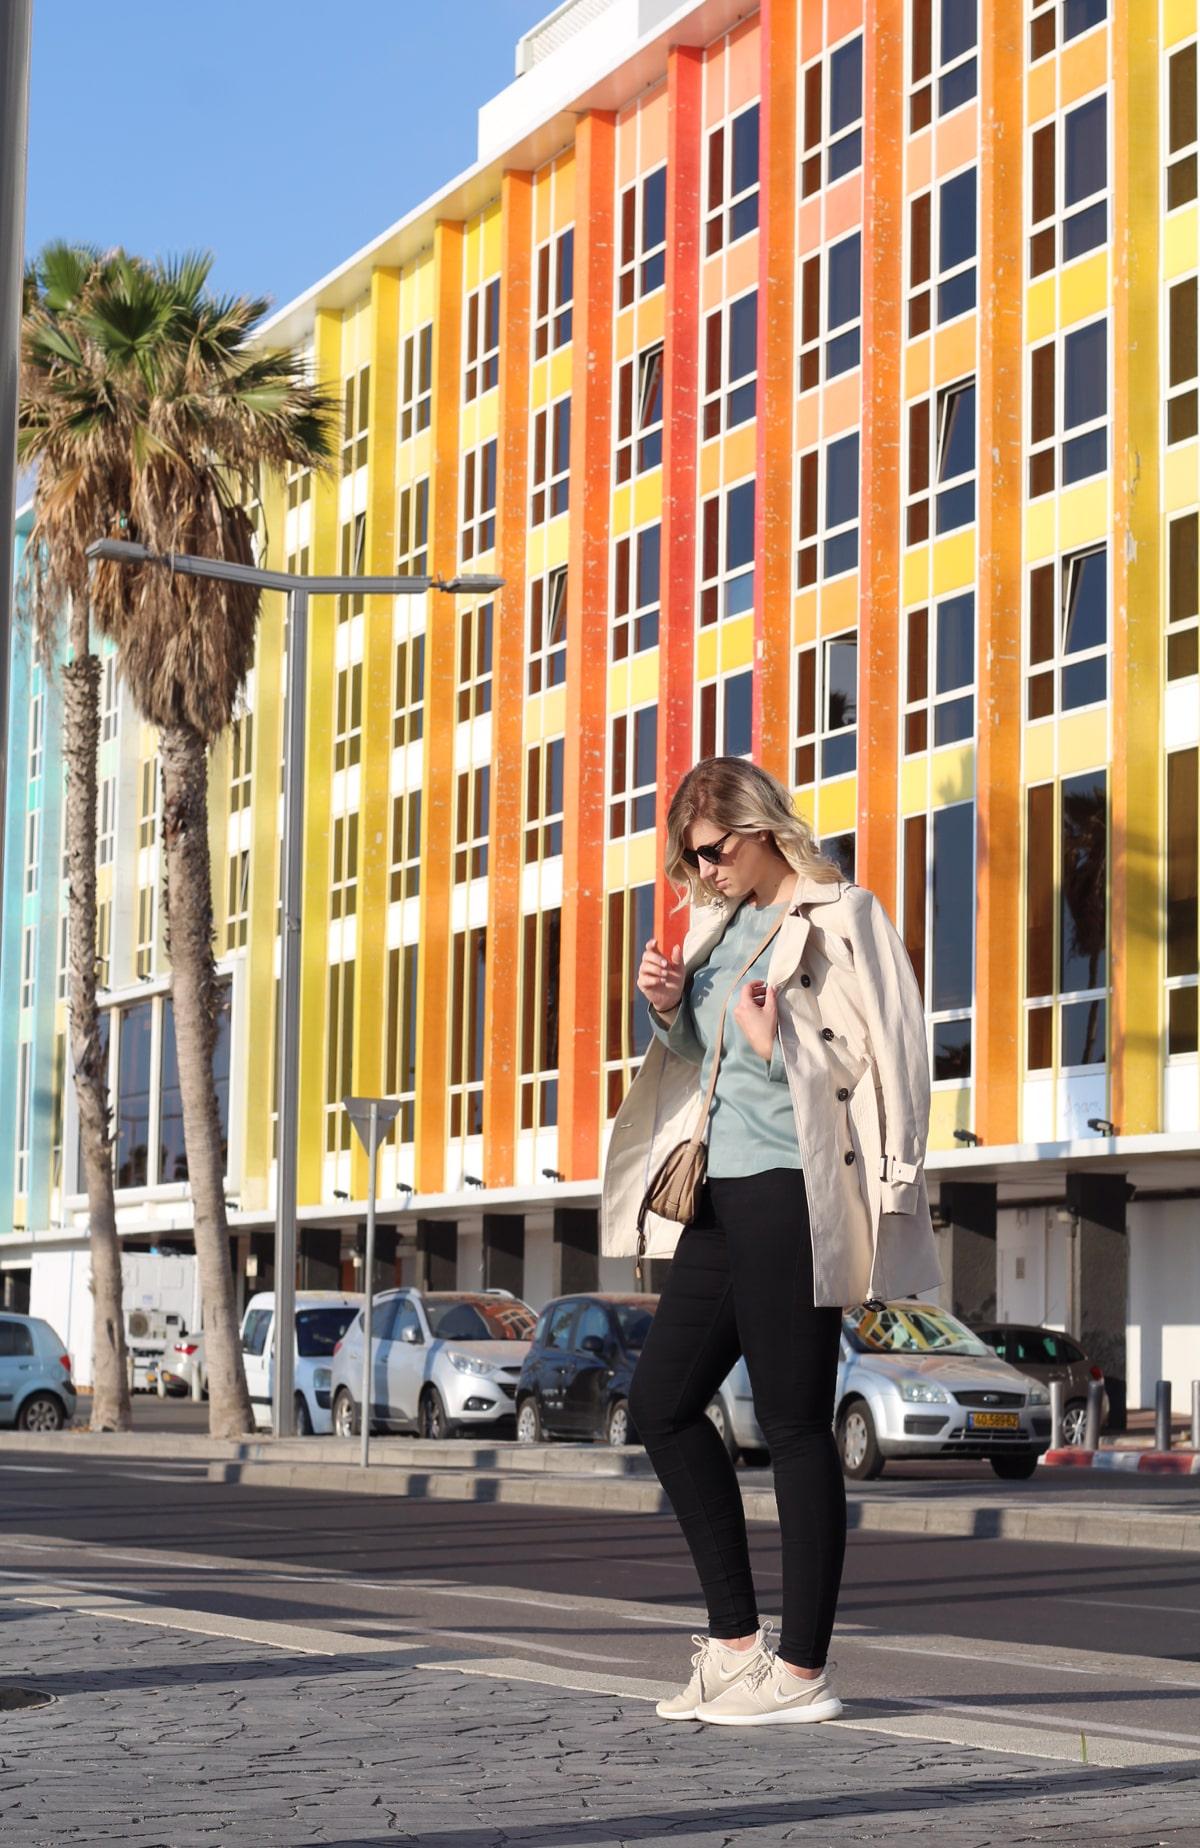 Tel Aviv Buntes Hotel Farbverlauf